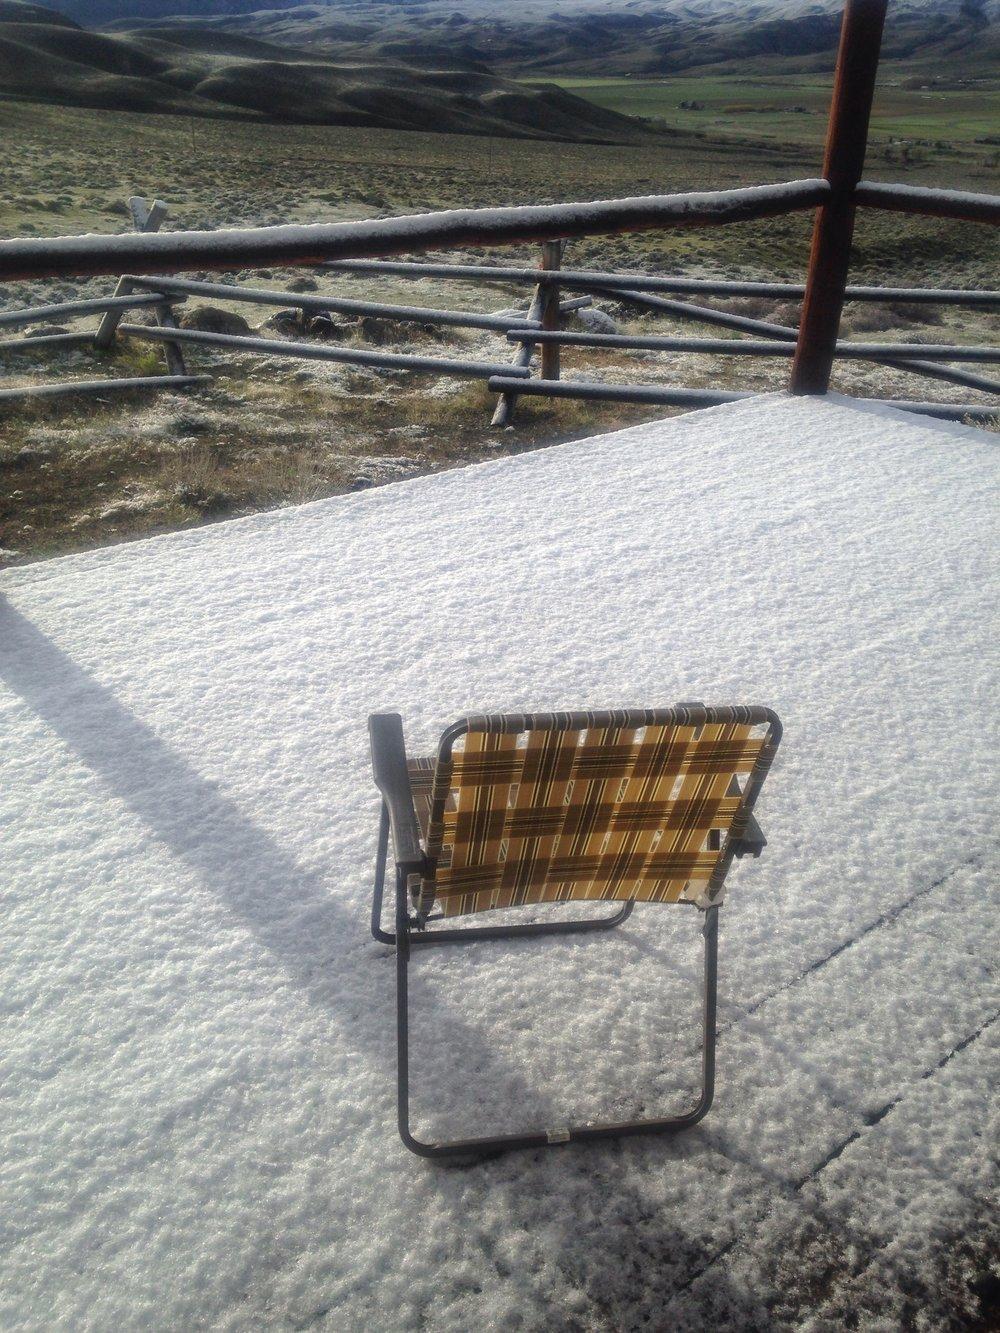 Cabin deck, Wapiti, Wyoming, 8 a .m., April 26, 2017.